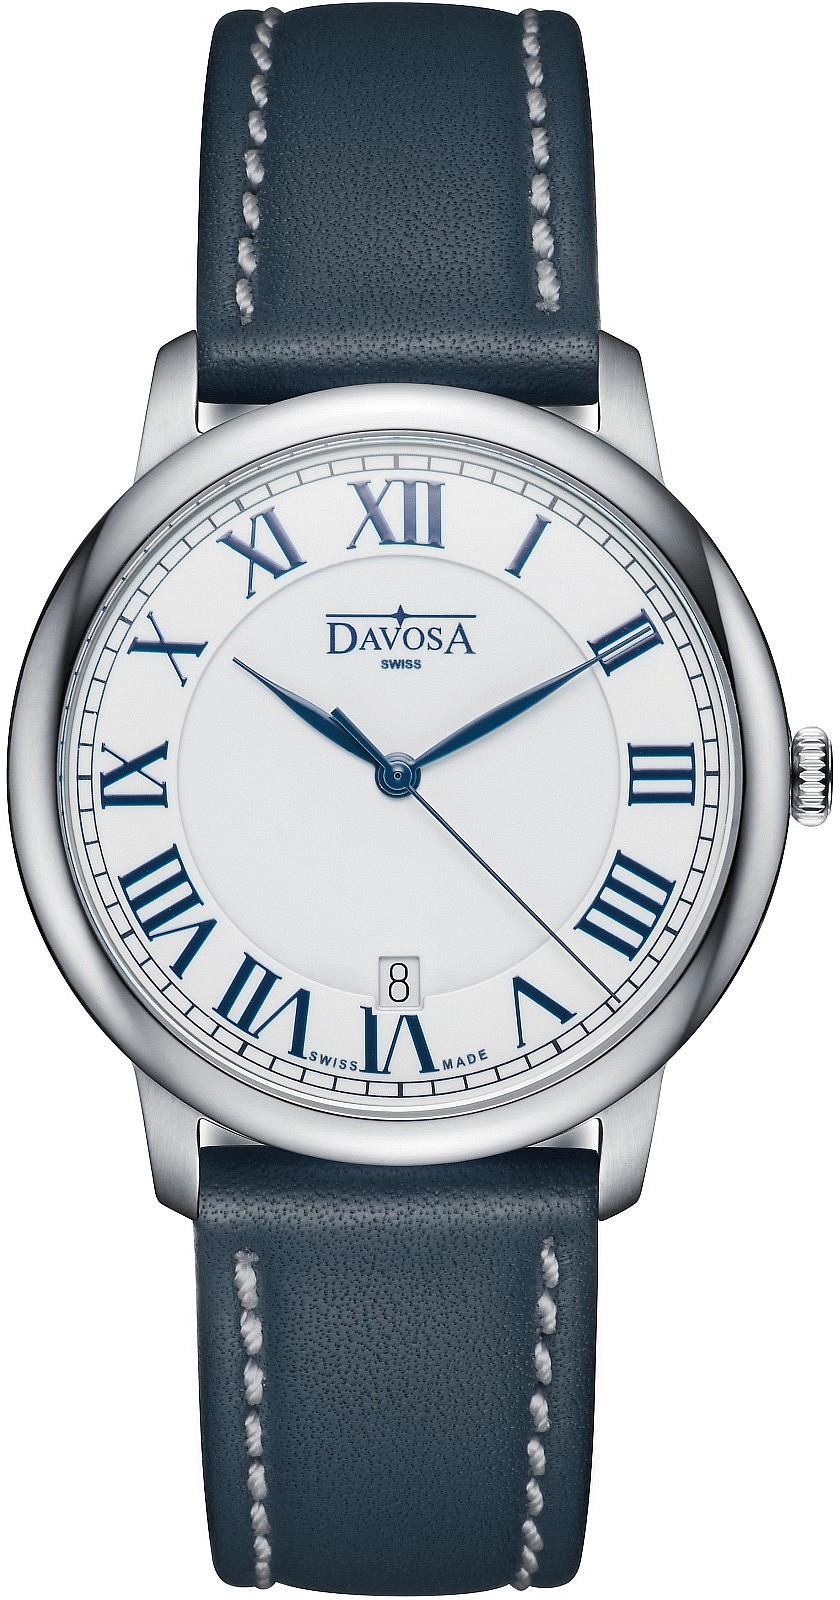 zegarek-damski-davosa-amaranto-167-561-22-2